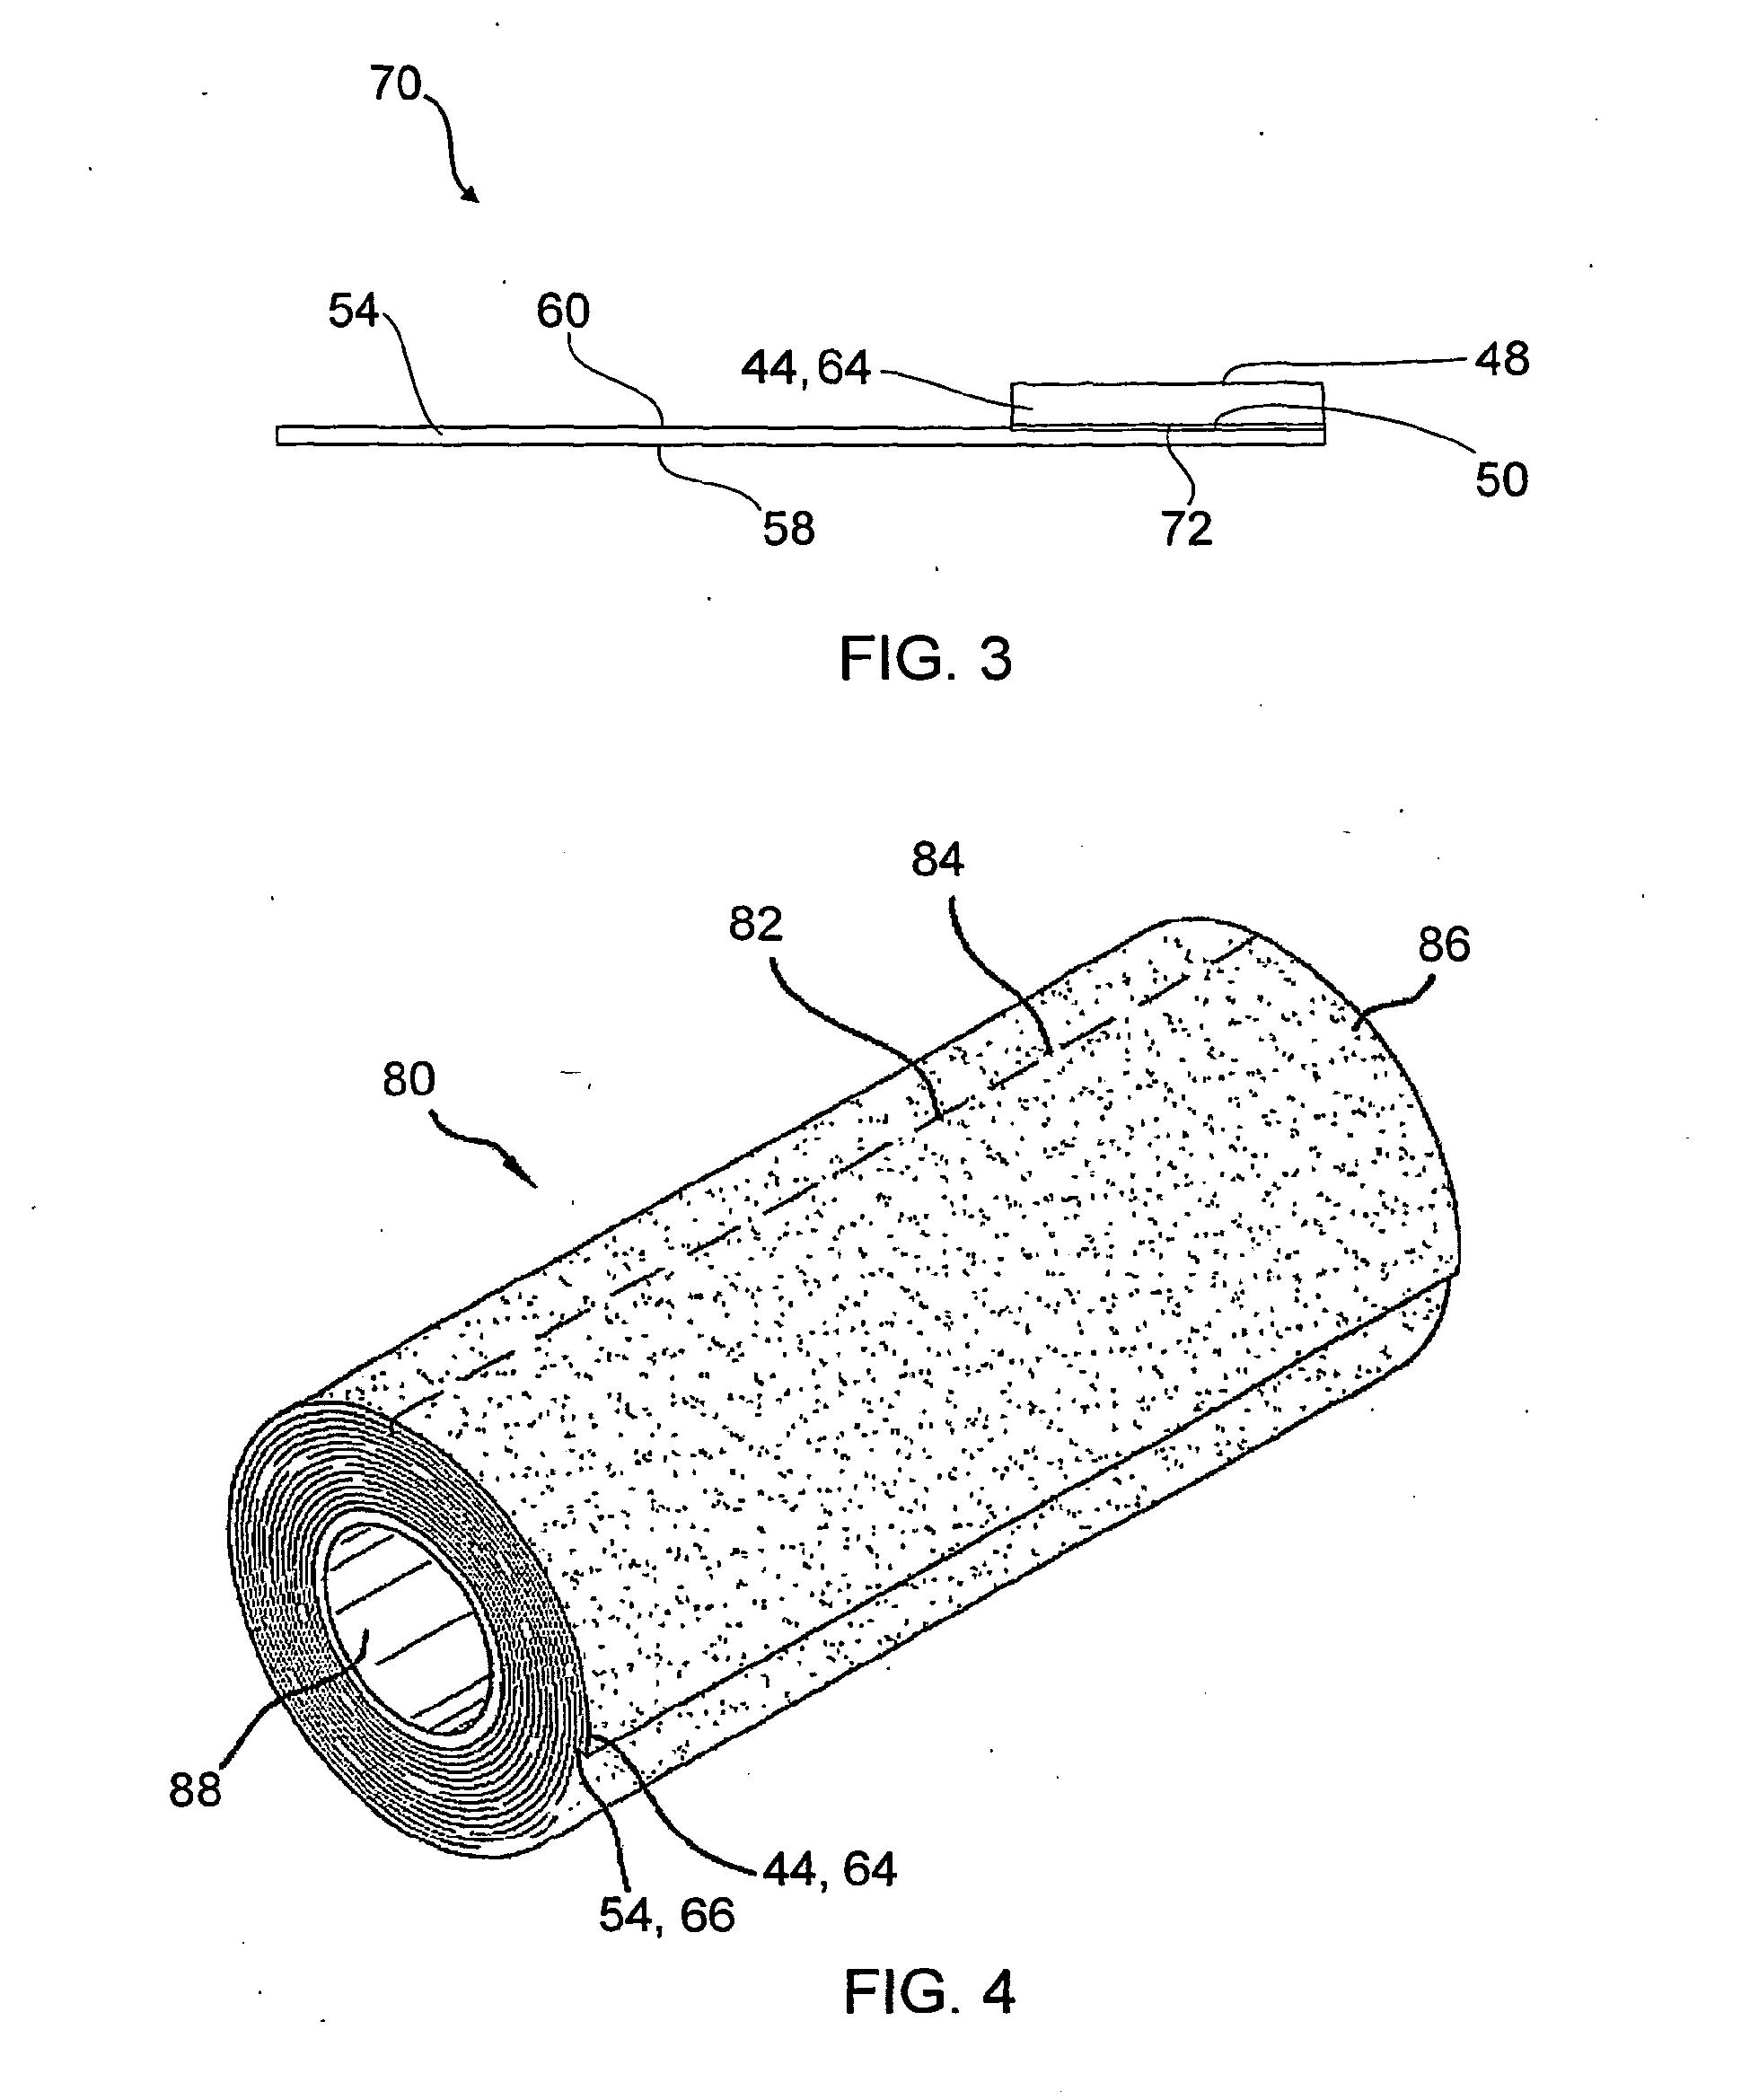 foam roller diagram